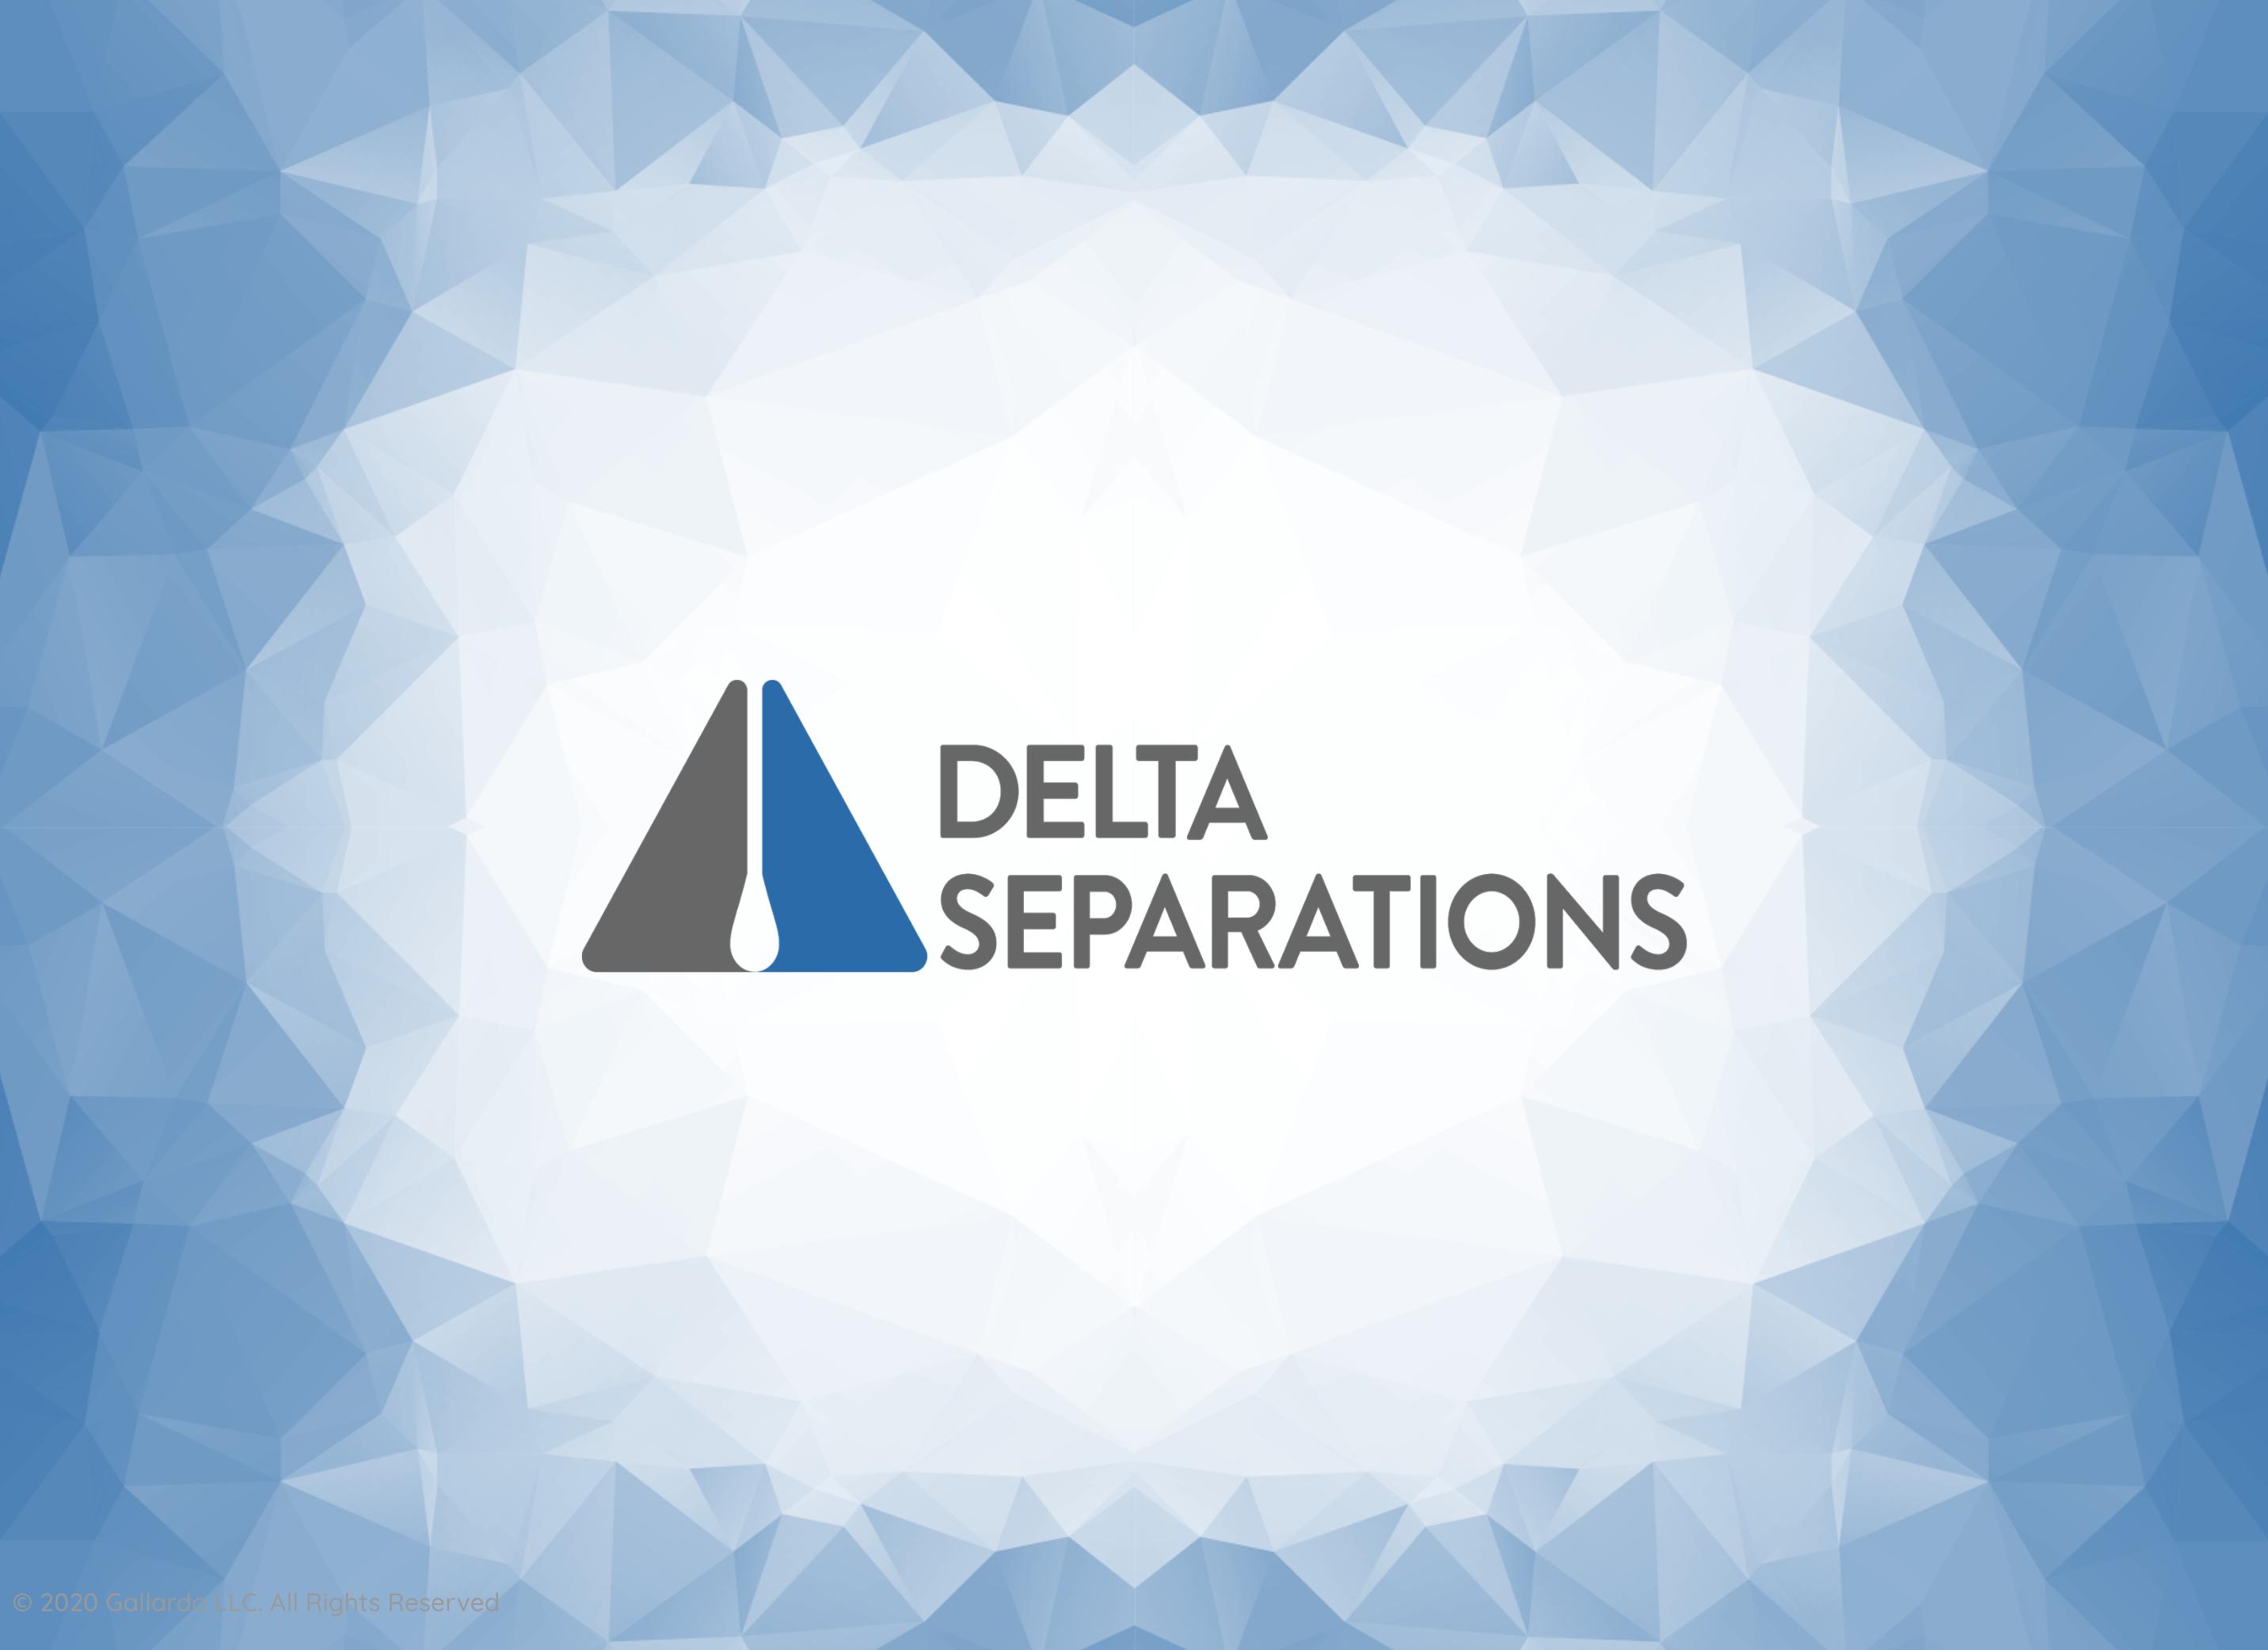 Full screen logo image